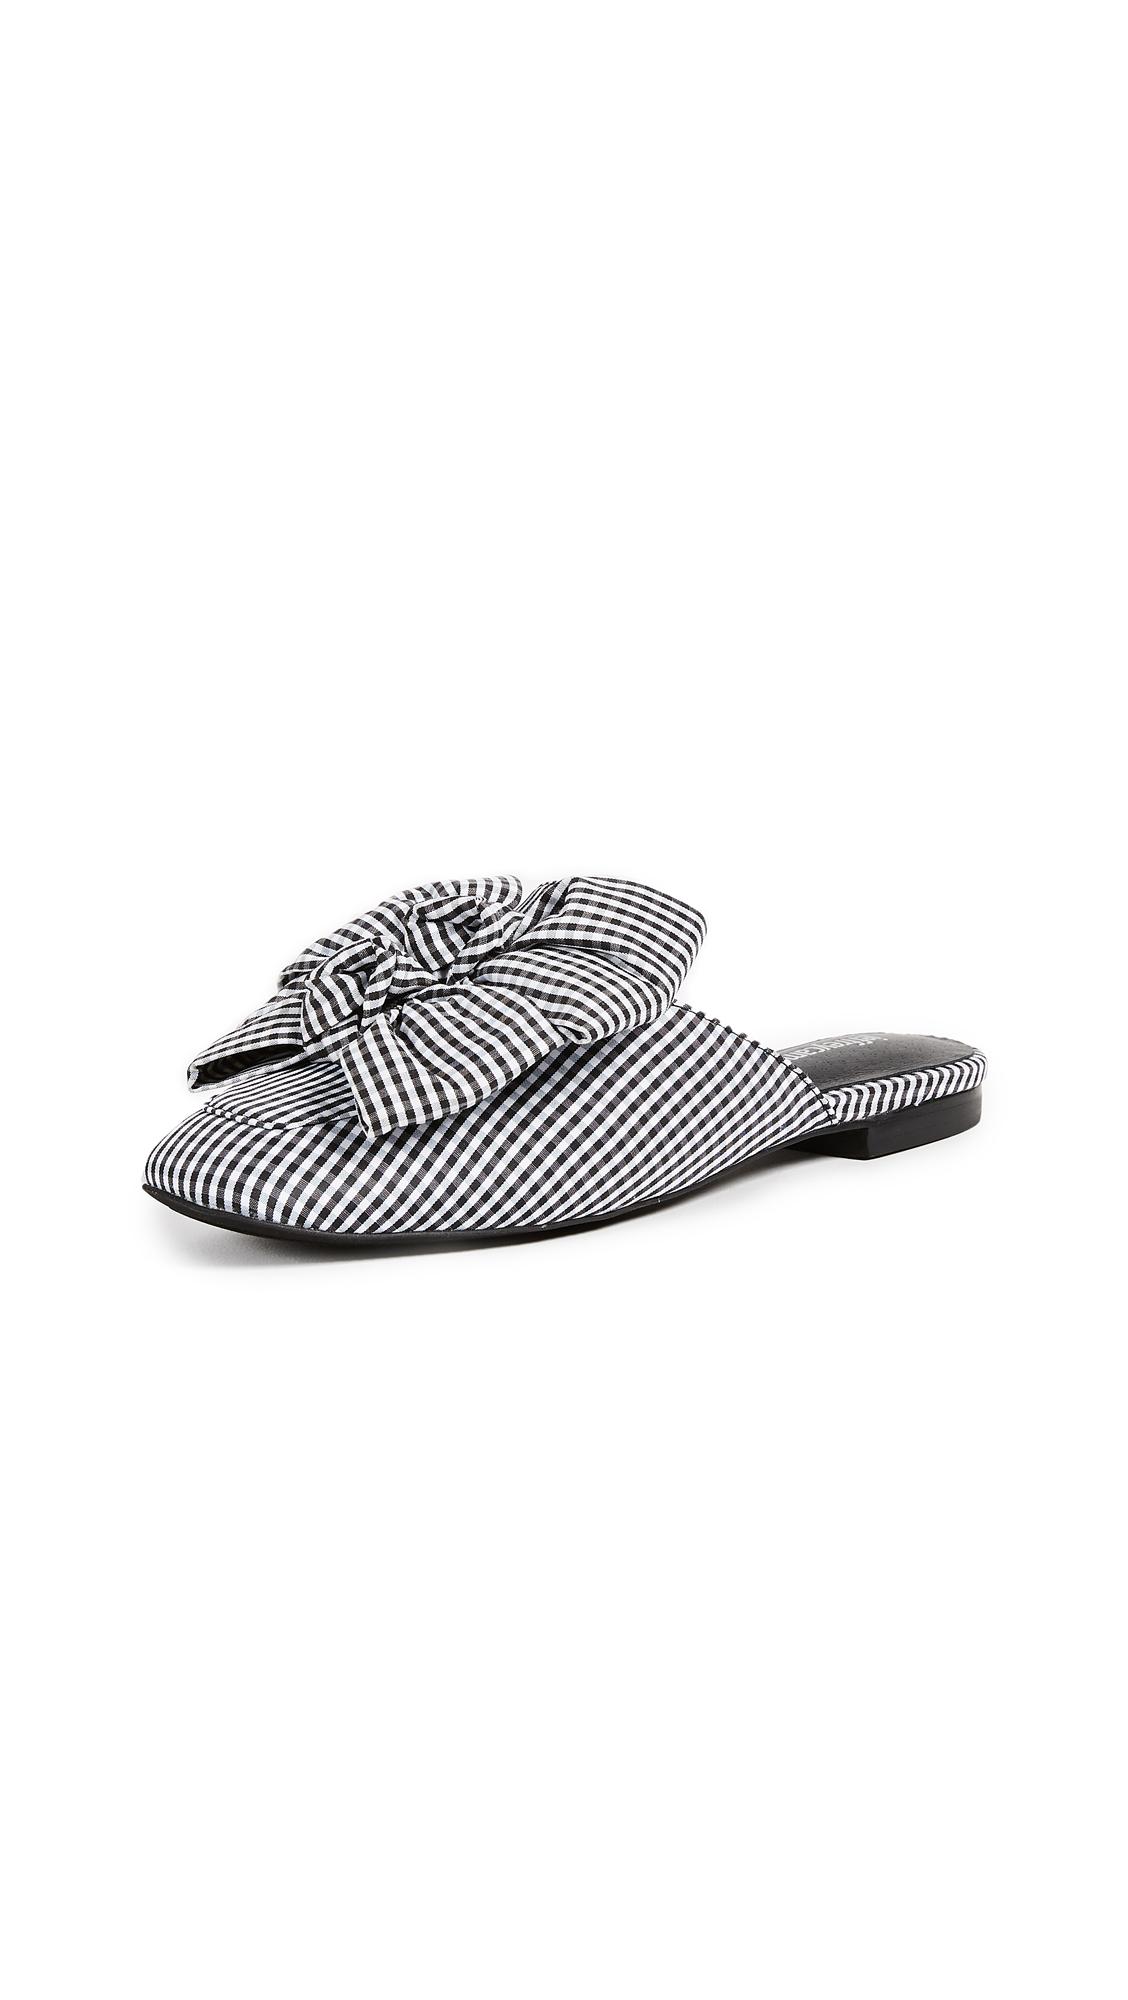 Jeffrey Campbell Ravis Bow Slides - Black/White